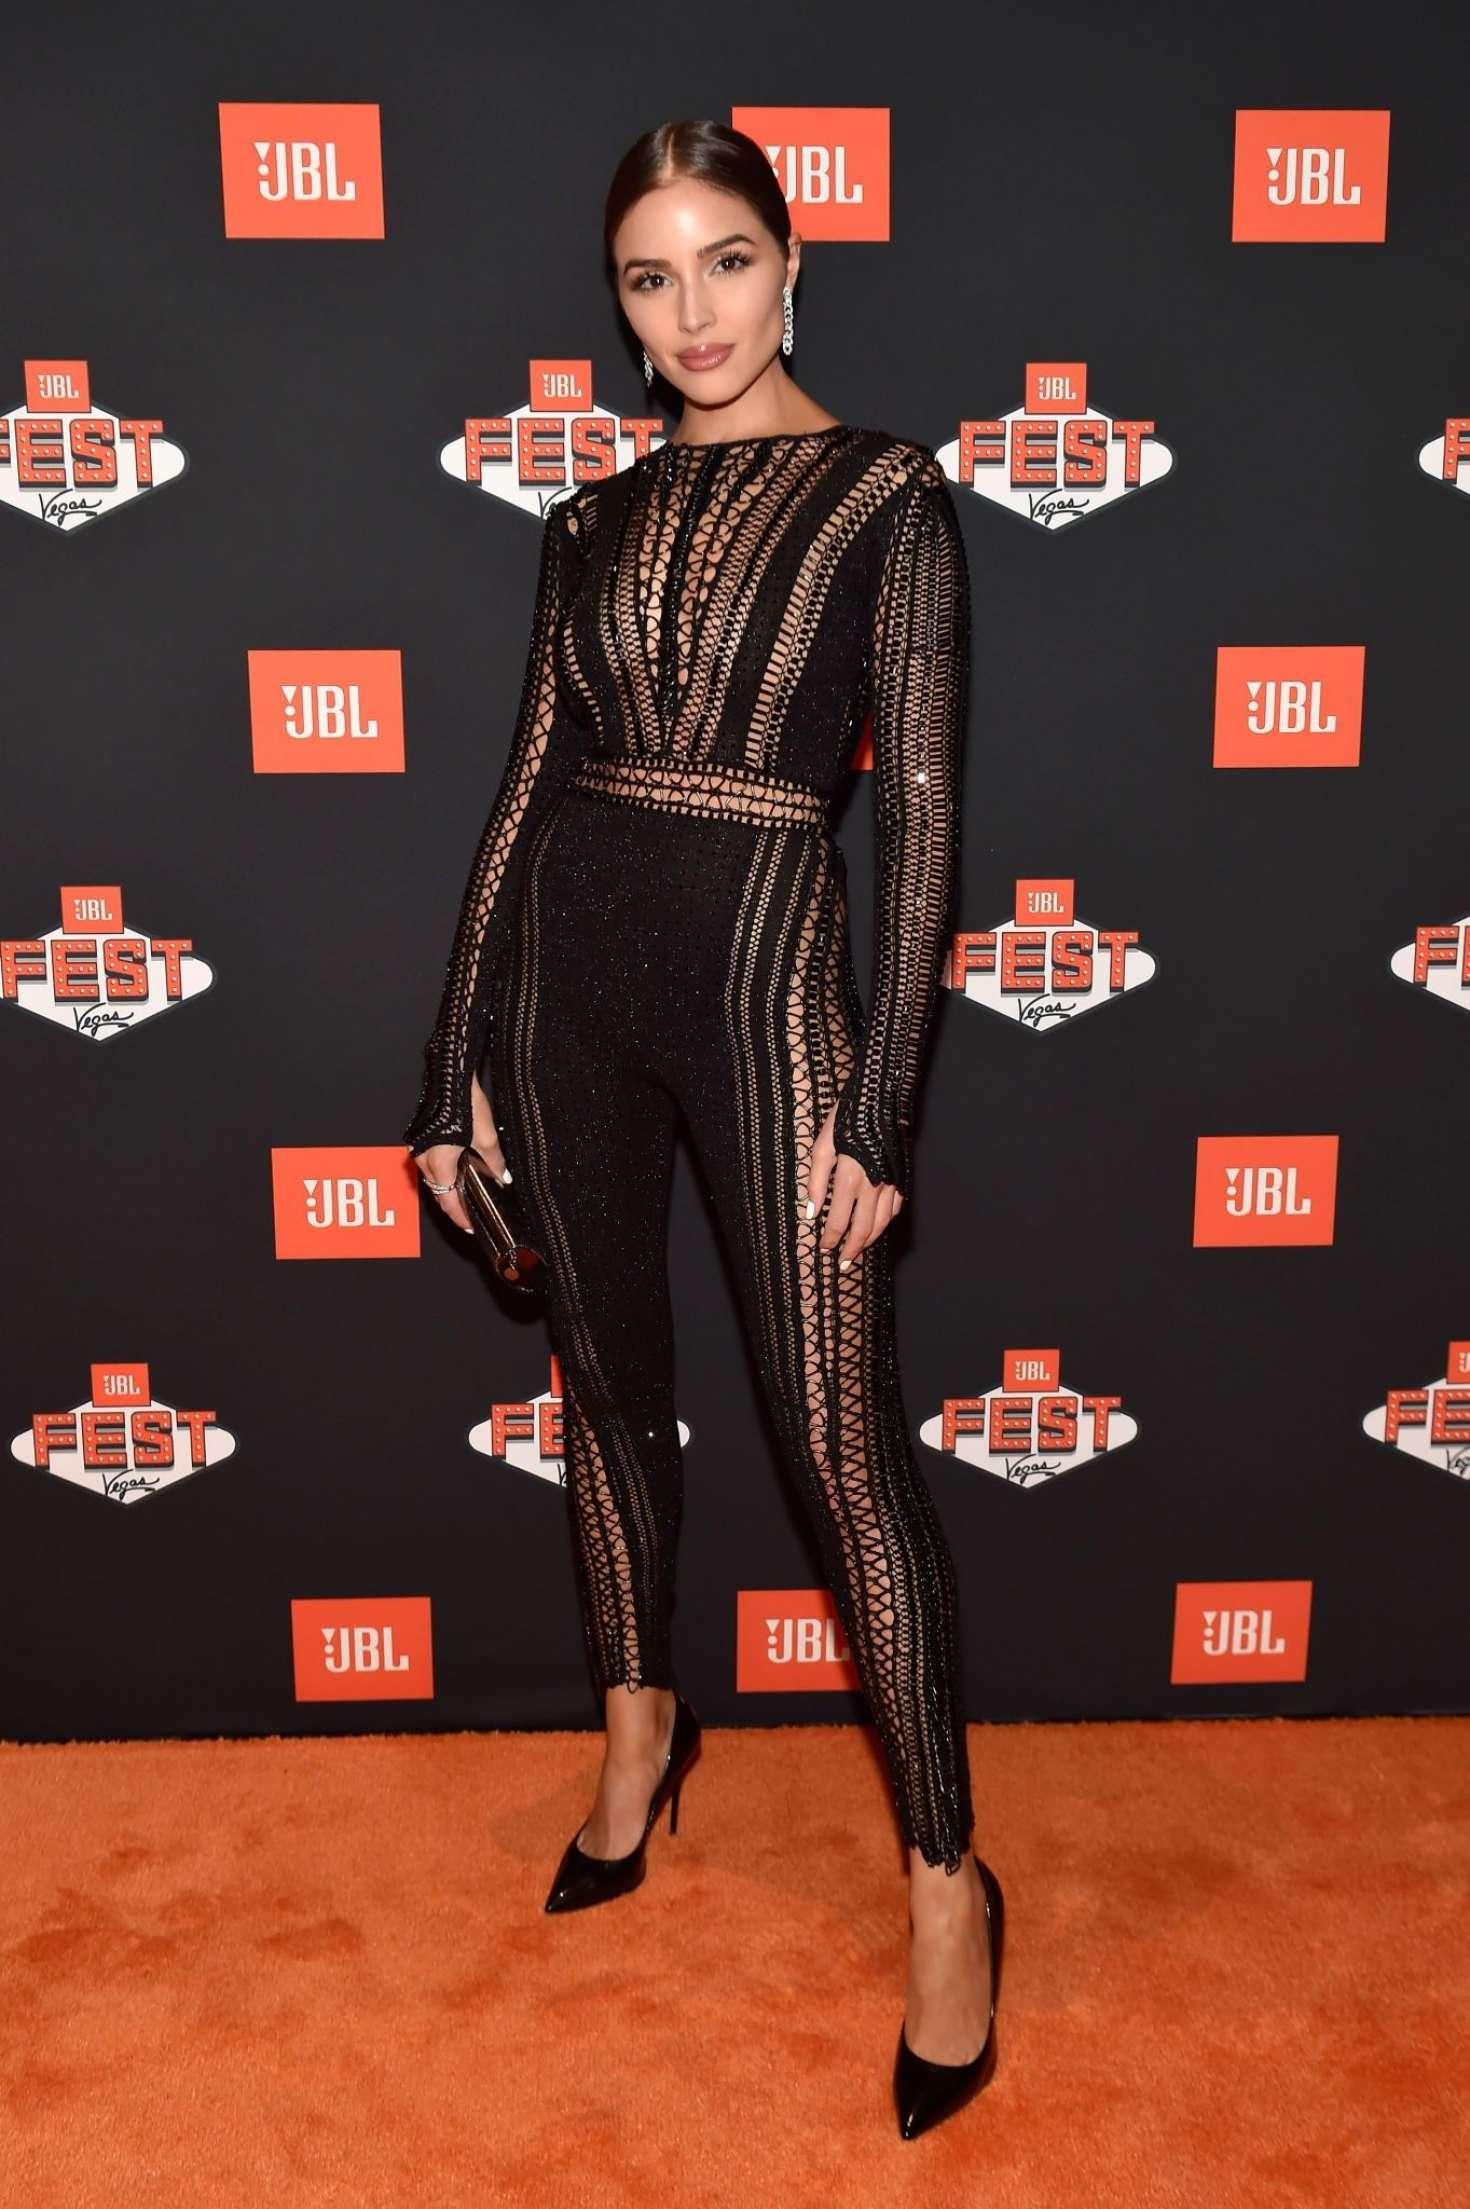 Olivia Culpo – JBL Fest 2018 inside Caesars Palace in Las Vegas